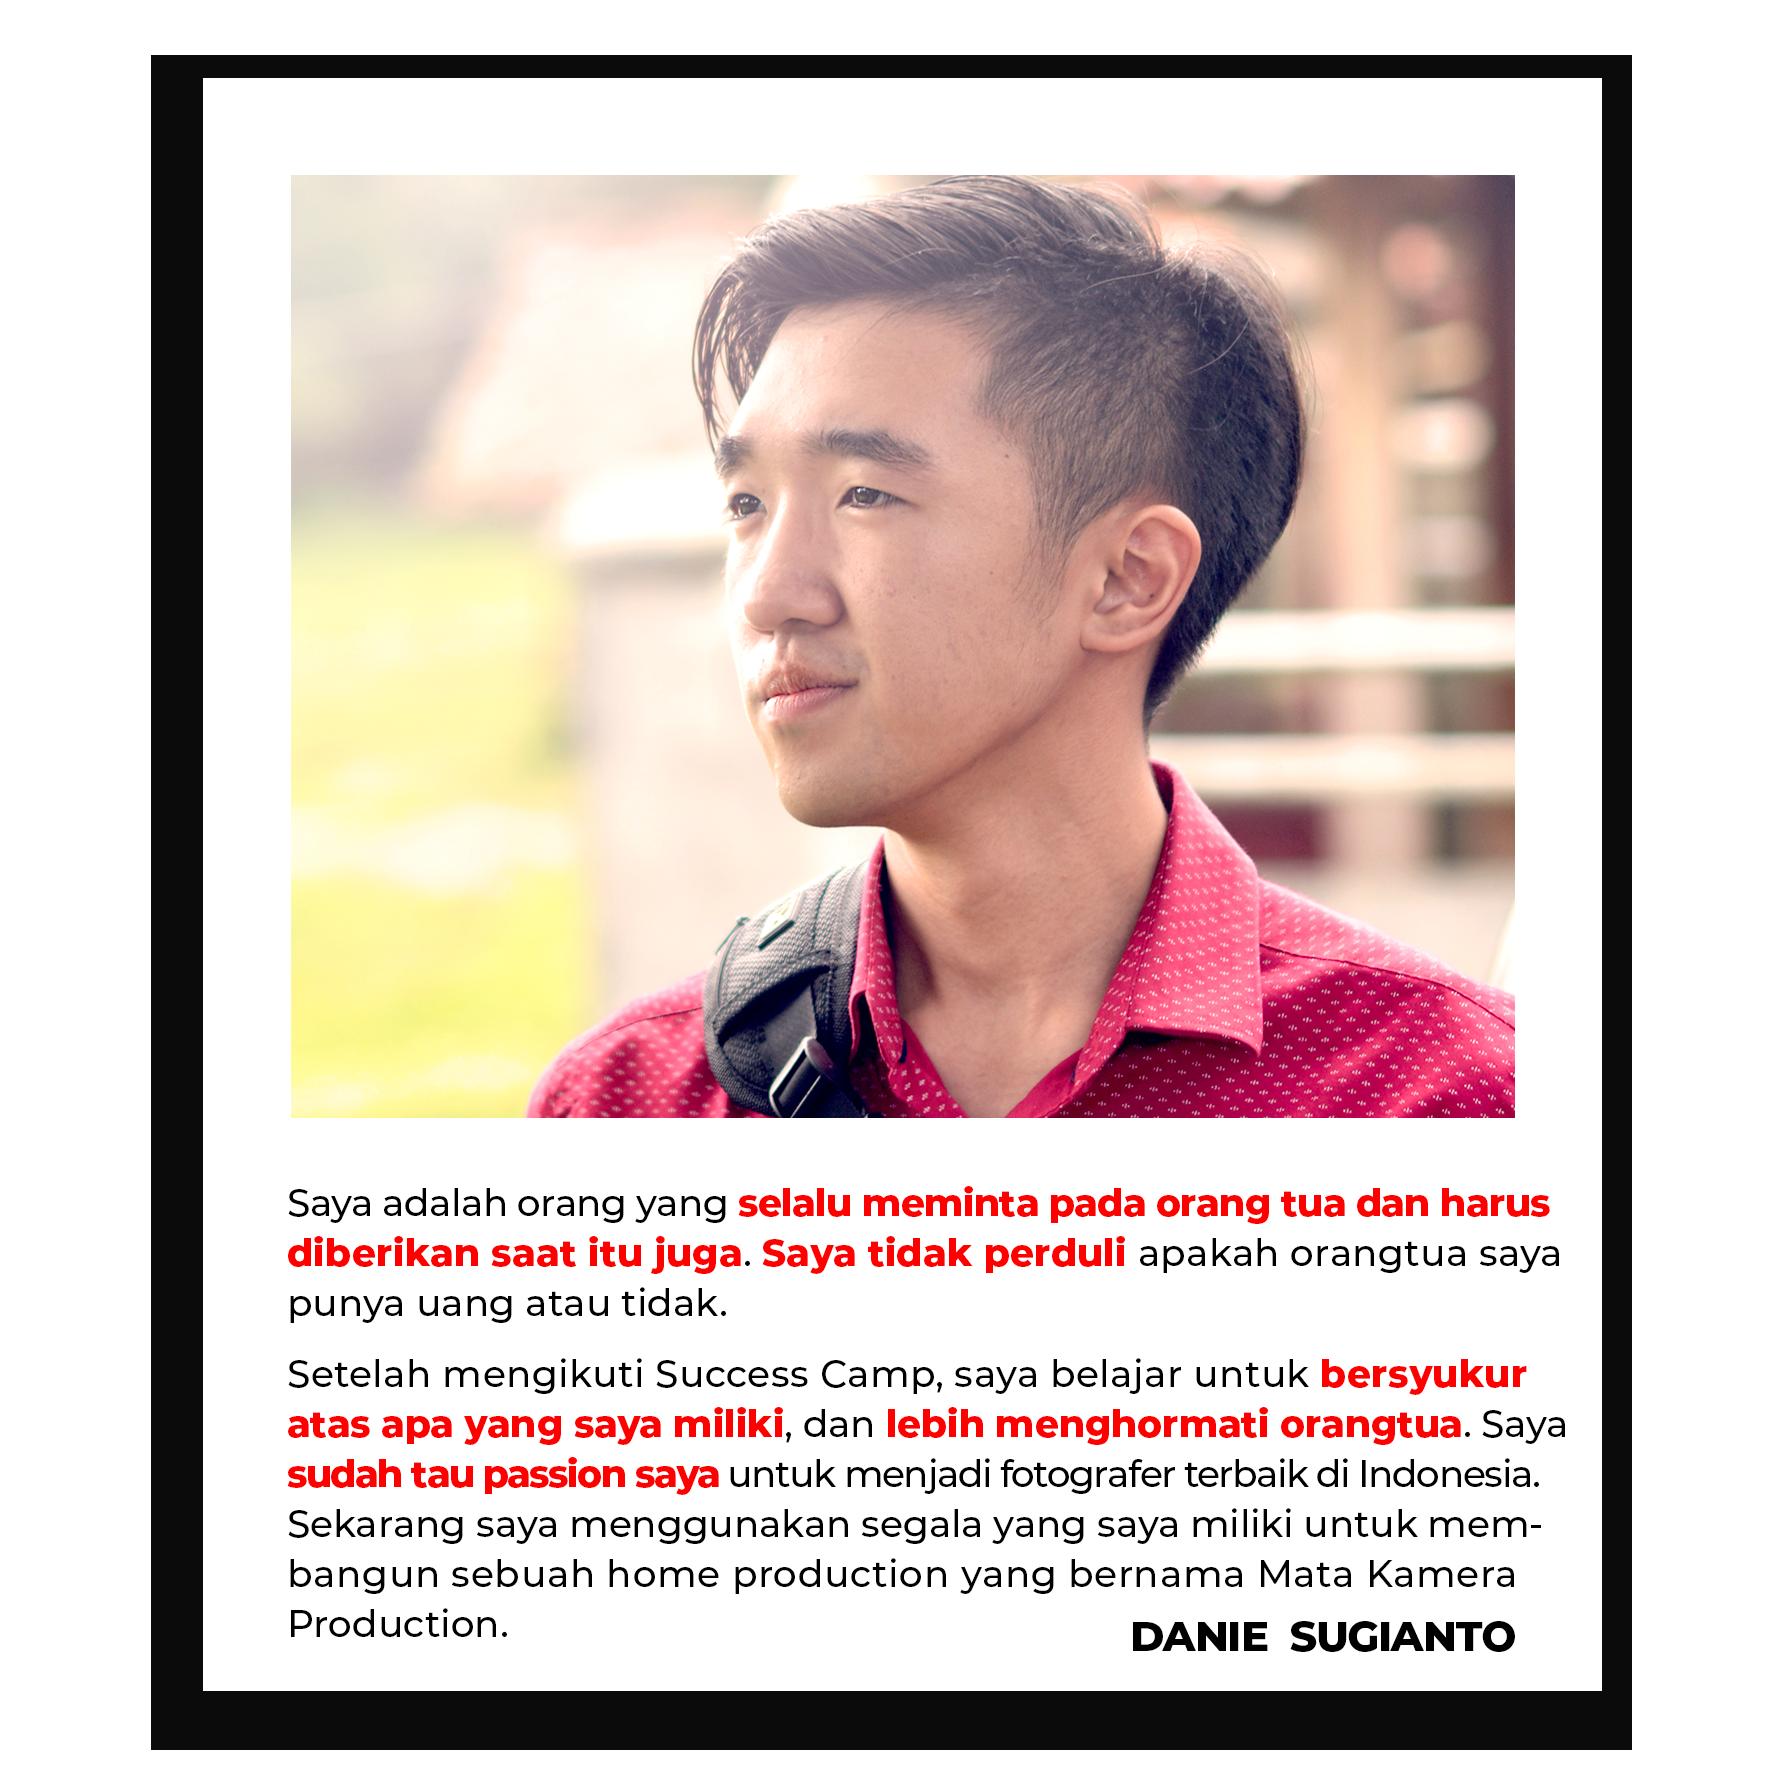 Danie-Sugianto_0002